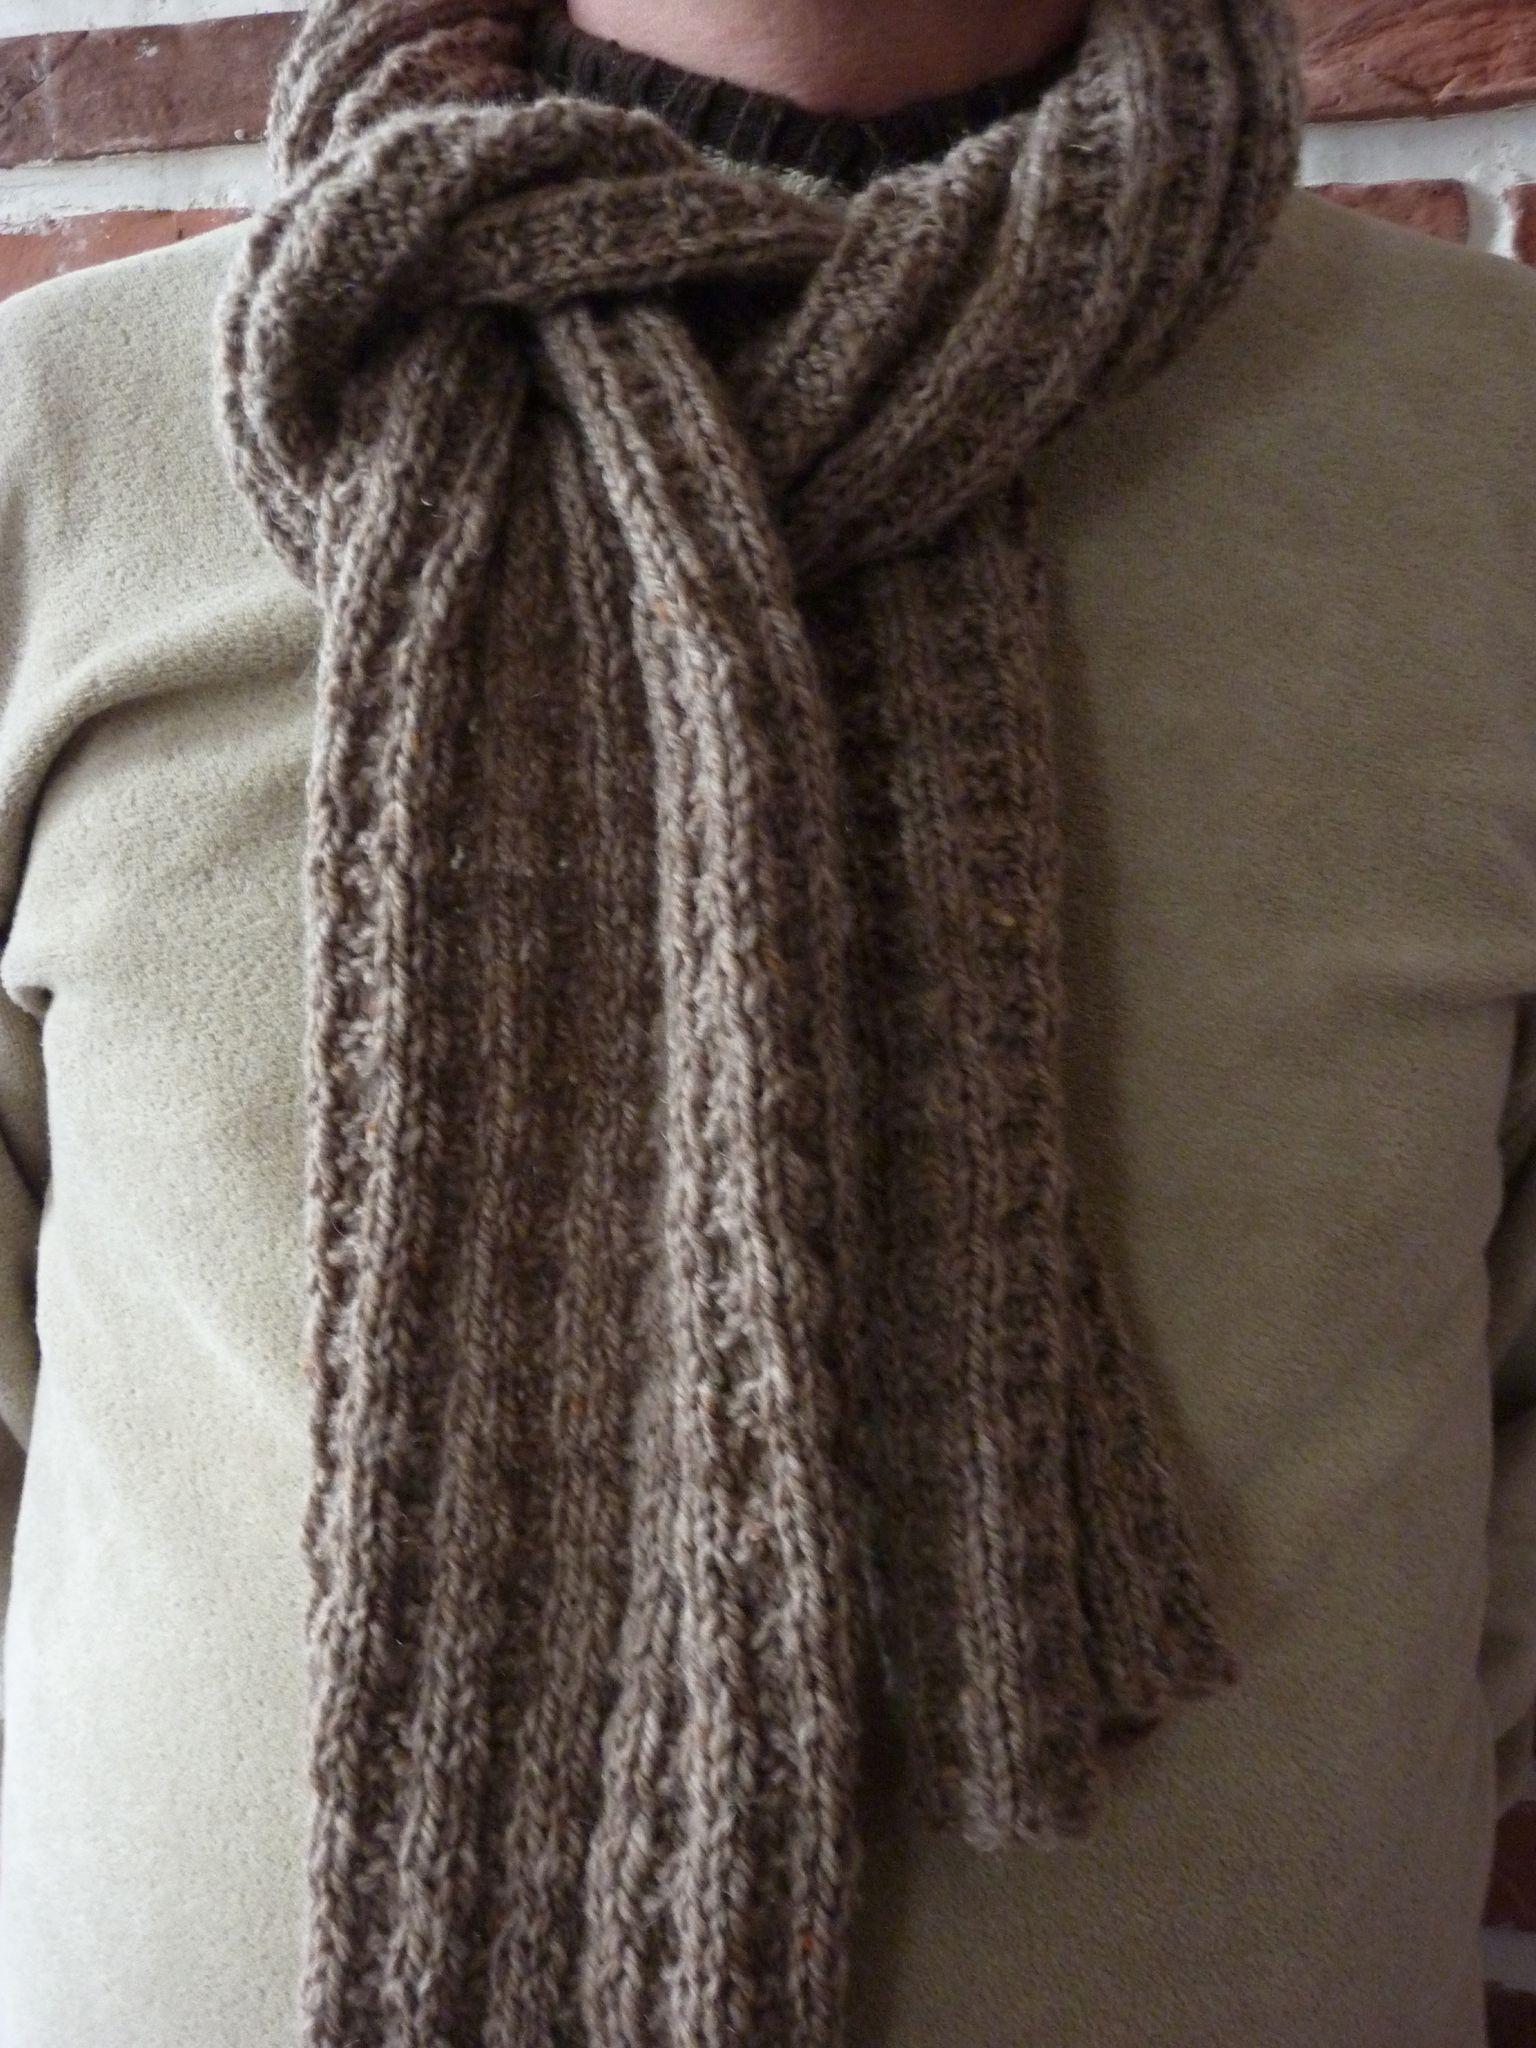 Modele a tricoter echarpe homme - Tricoter une echarpe homme ...